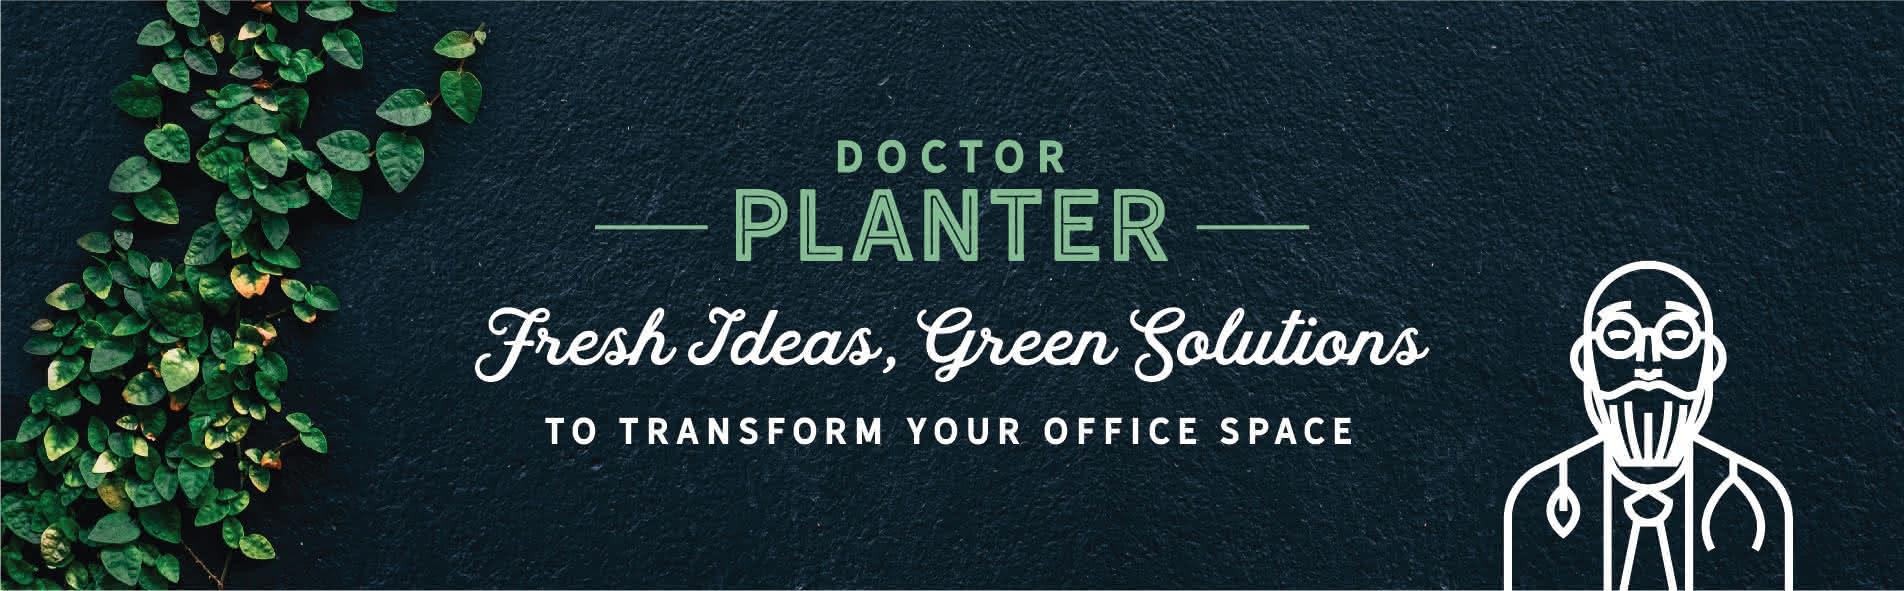 Dr. Planter